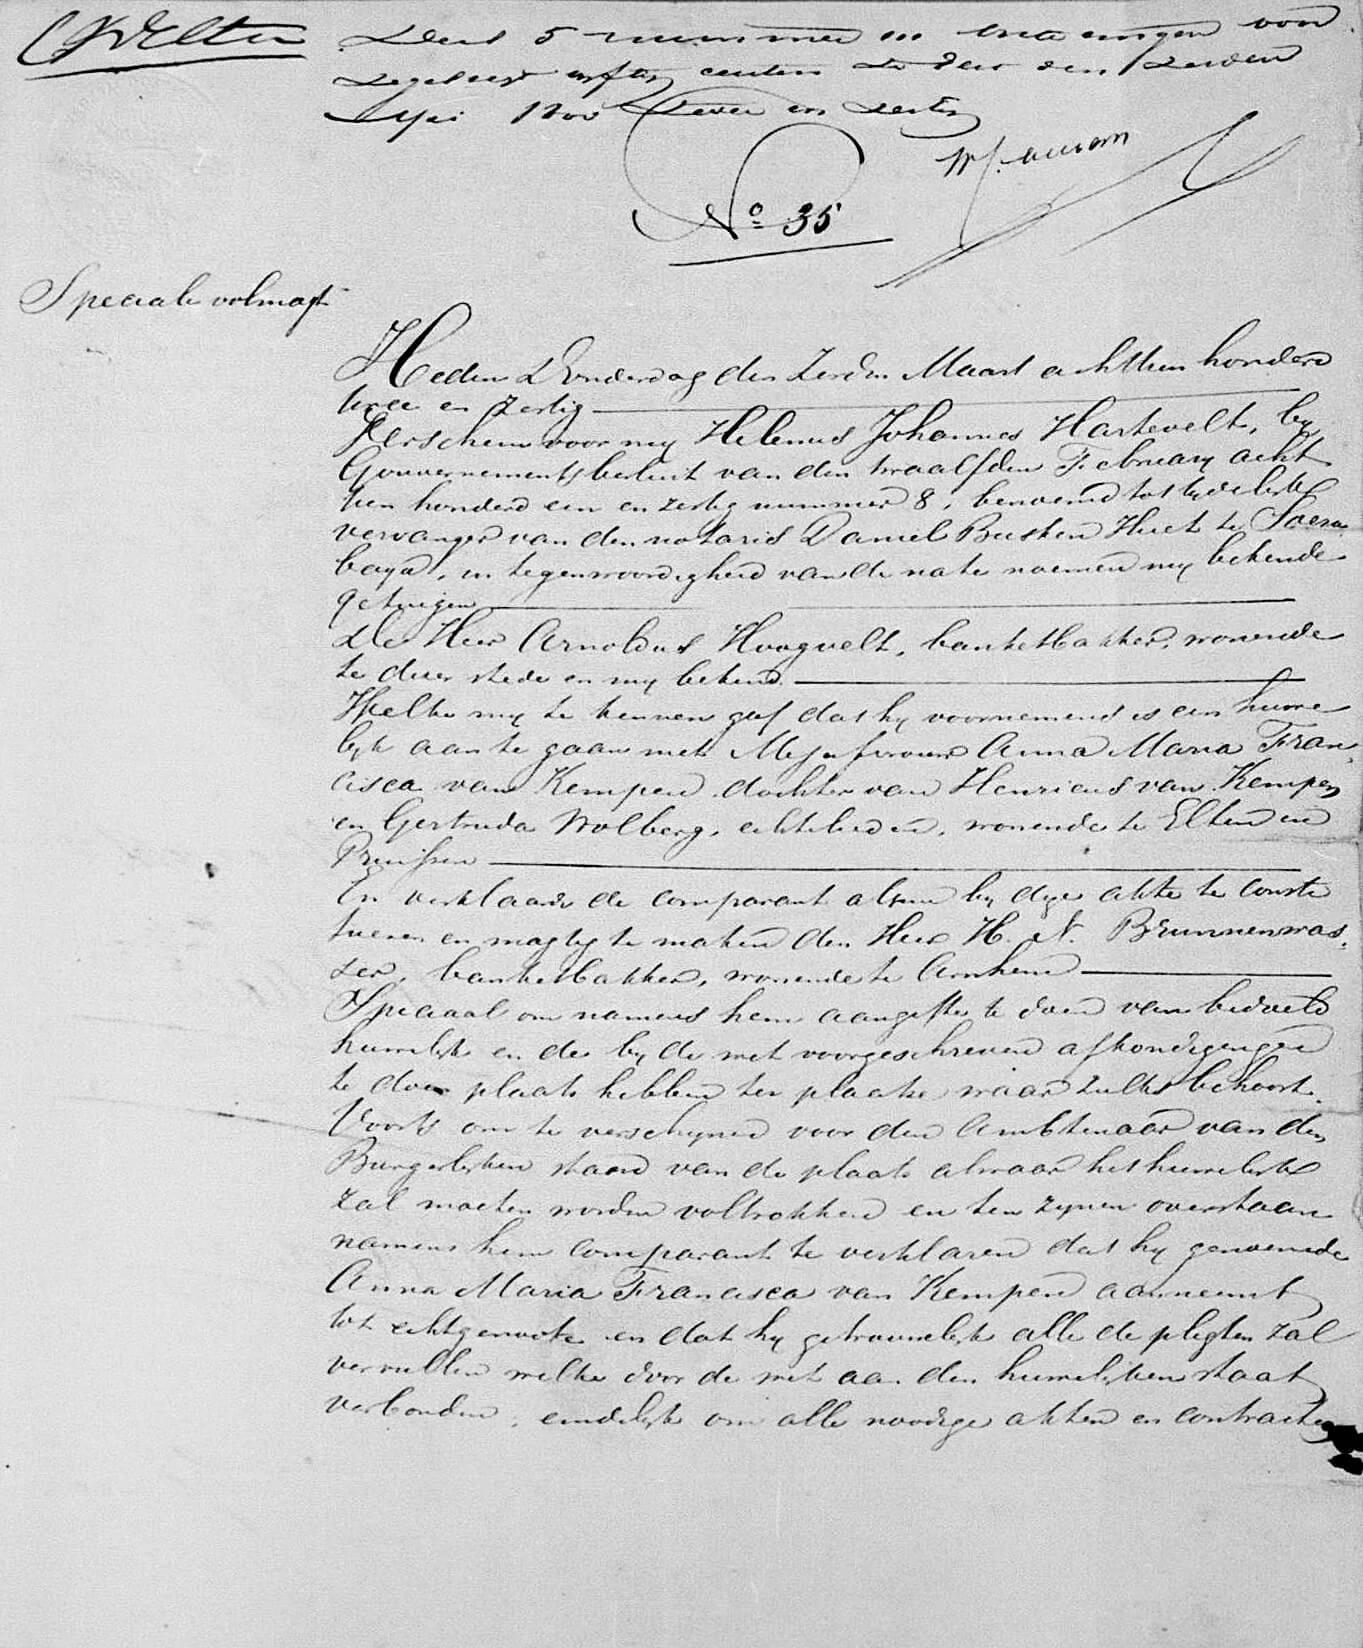 Notariële volmacht akte (Soerabaija, 7 maart 1862)